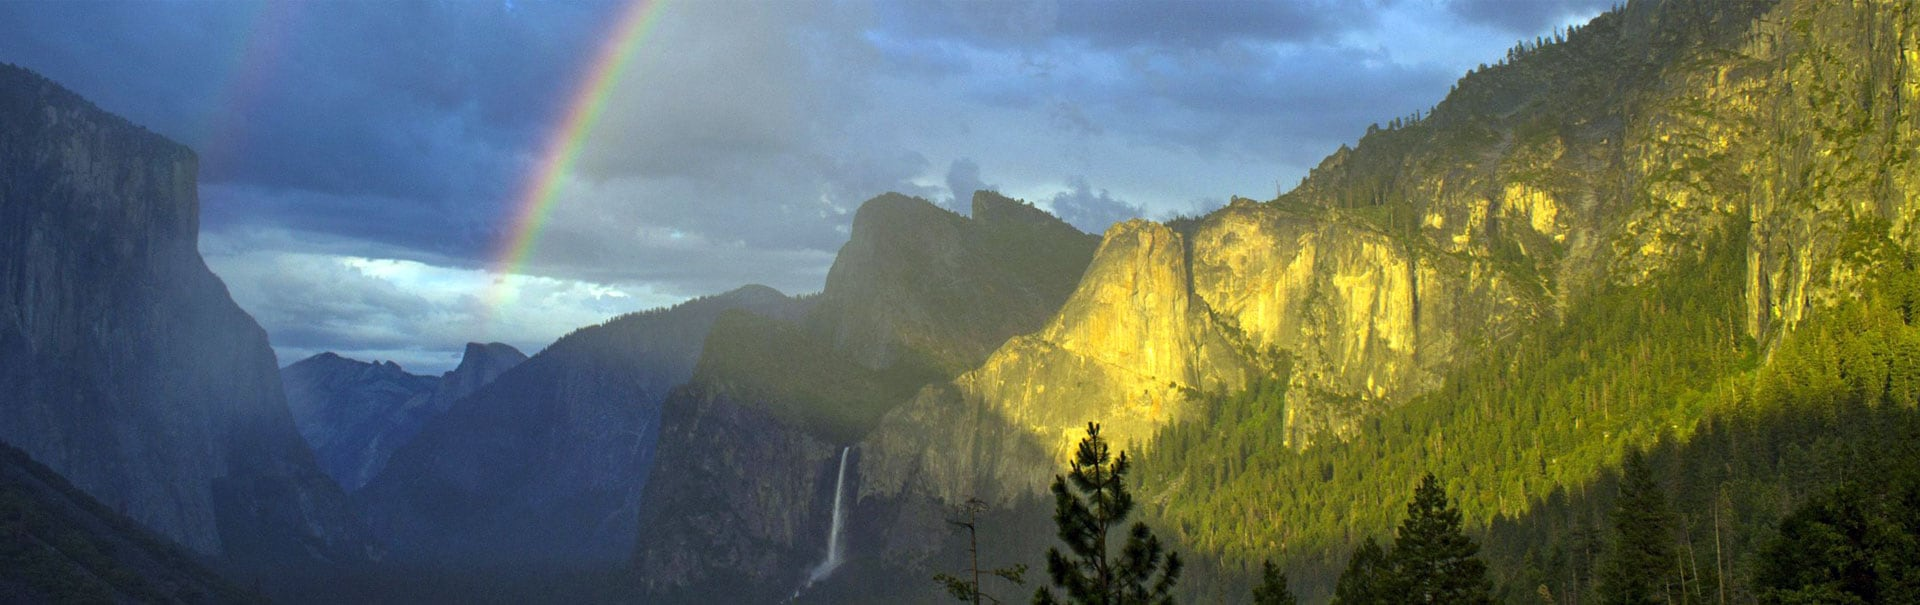 San Francisco(2N)Post Tour Holiday- Yosemite Park (PHUS4) Banner